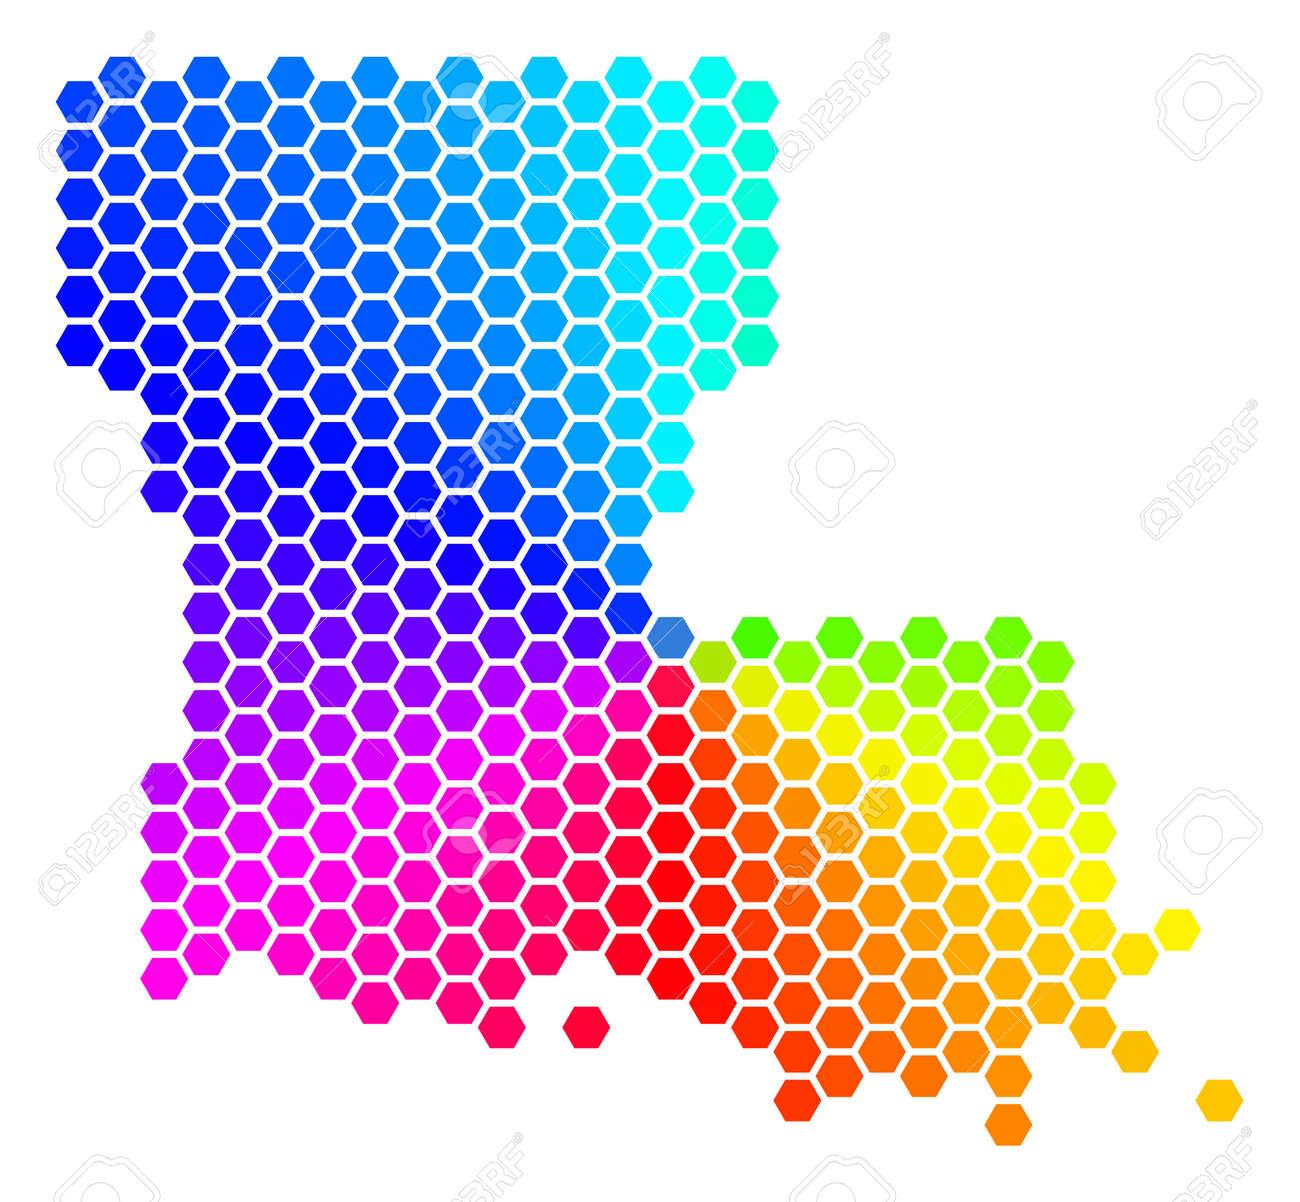 Geographic Map Of Louisiana.Hexagon Spectrum Louisiana State Map Vector Geographic Map In